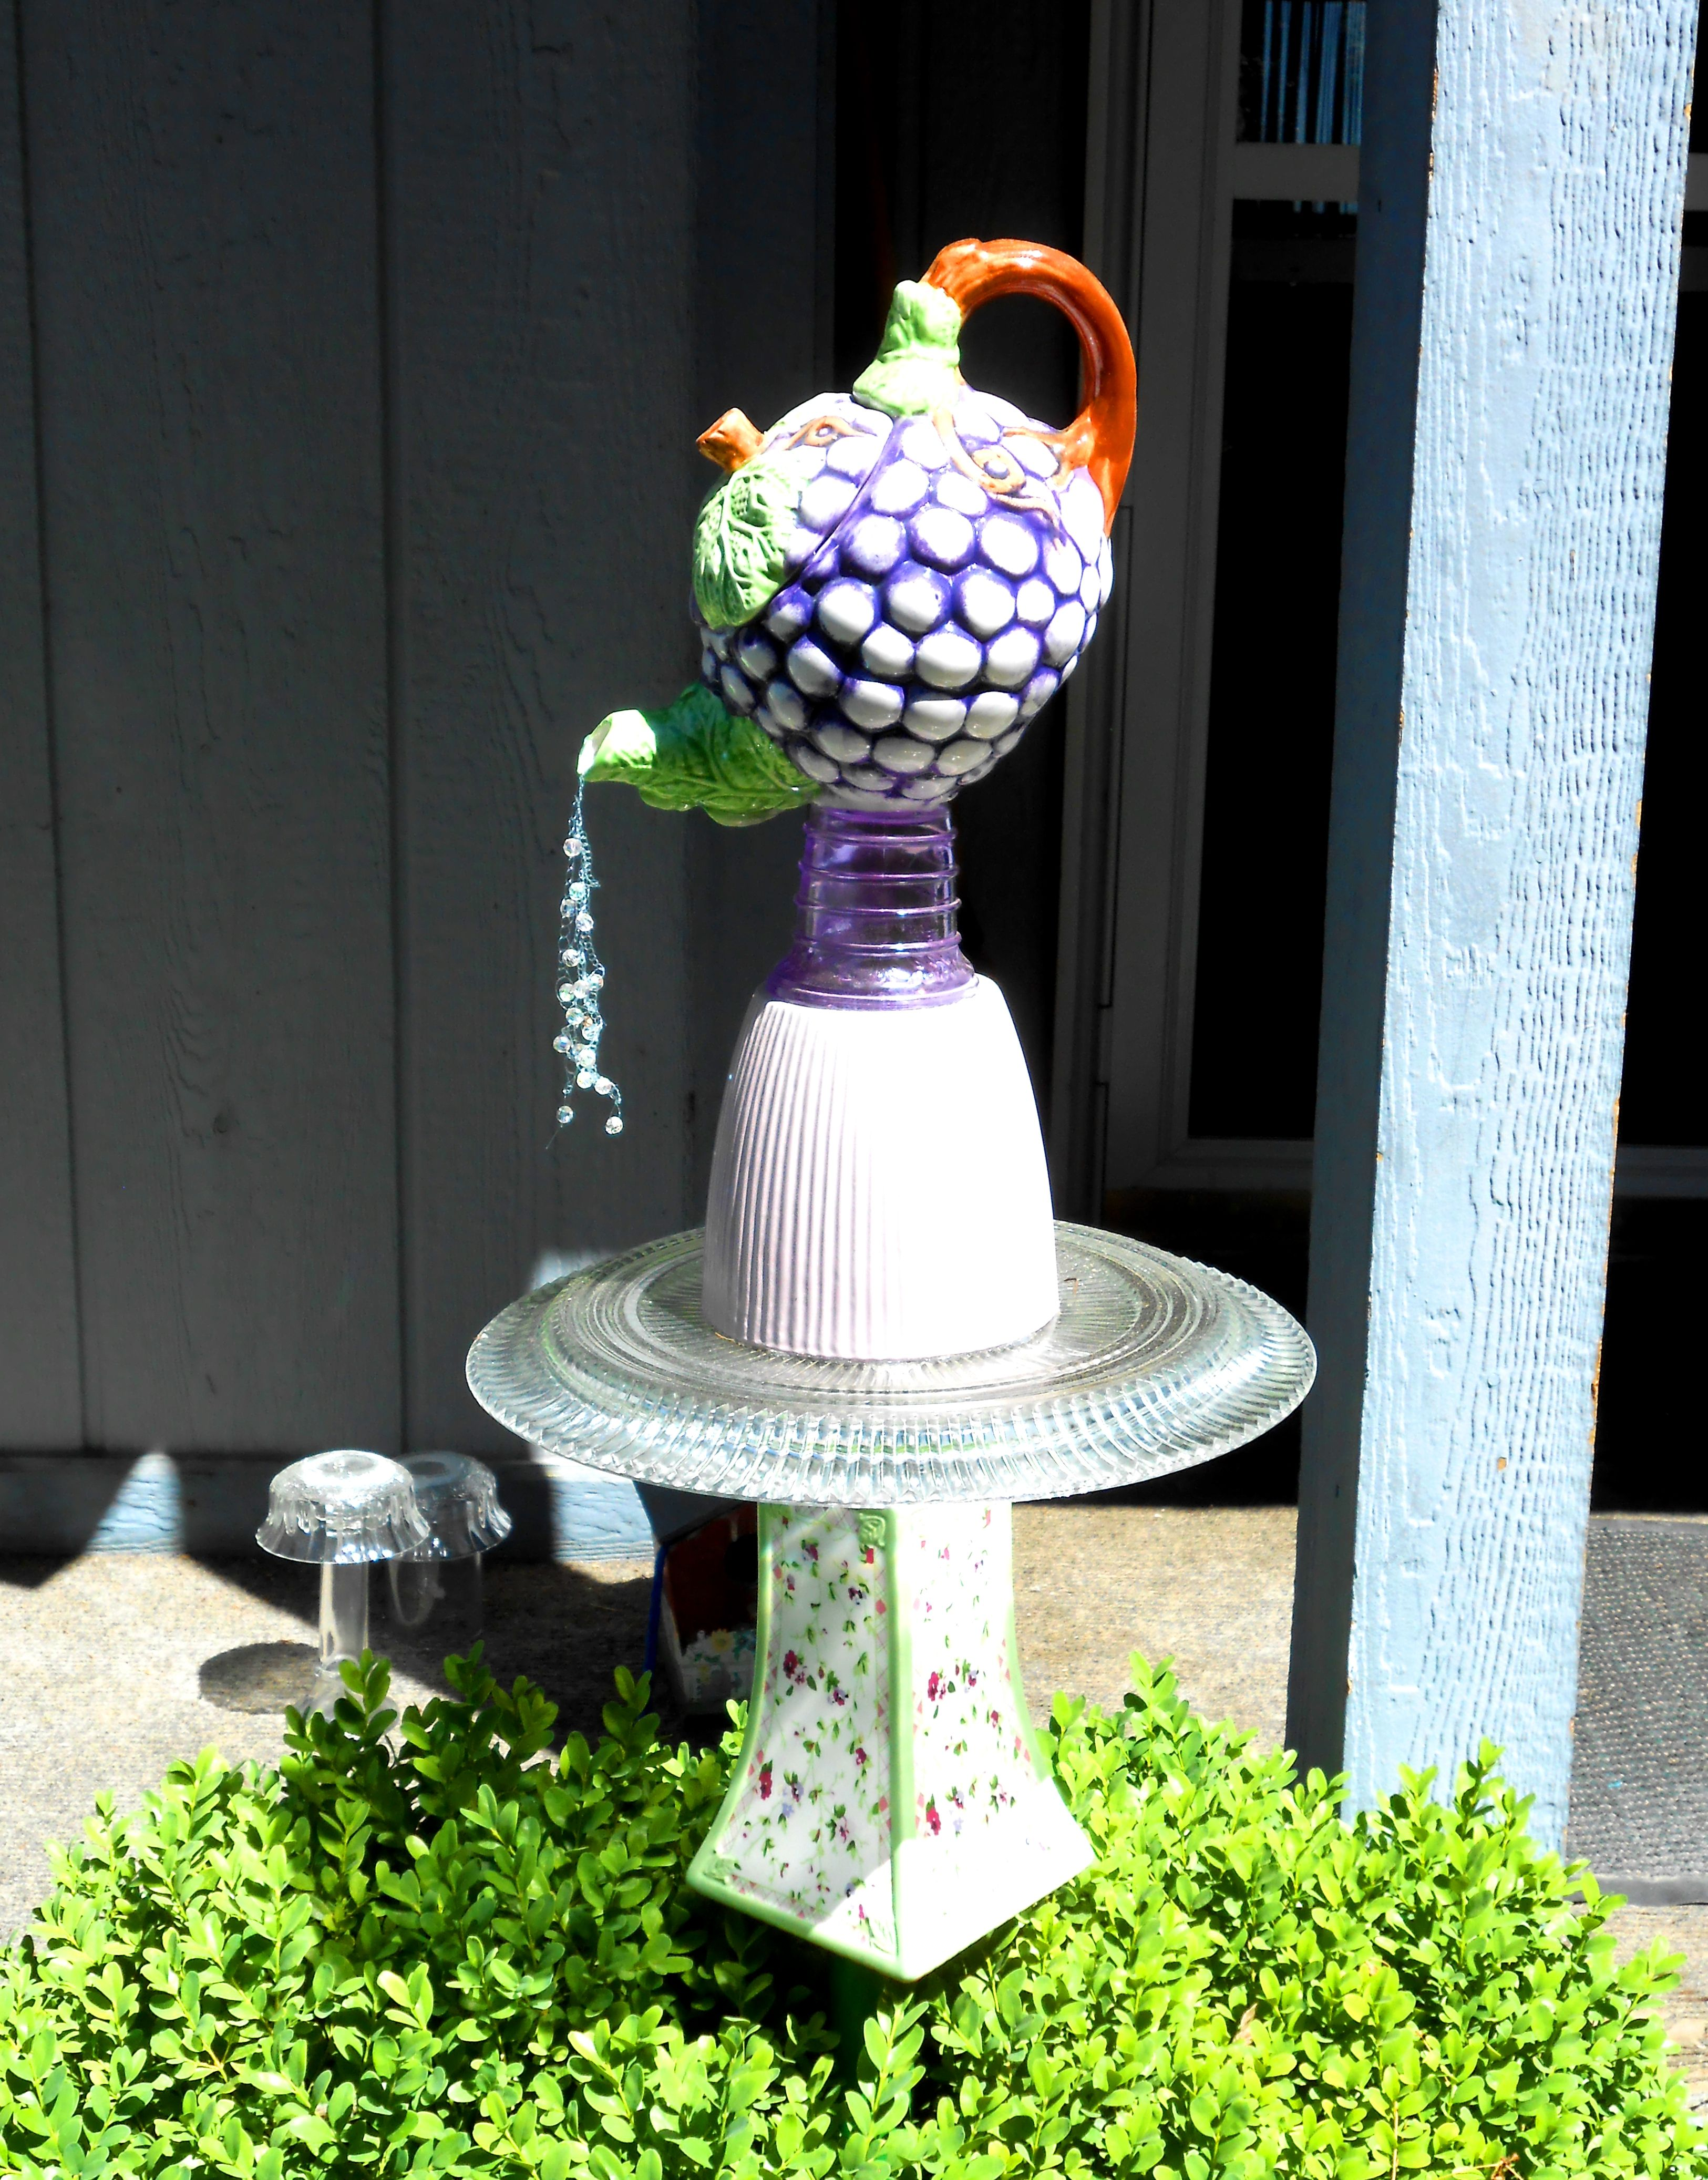 Garden art teapot tower jardineria pinterest for Manualidades de jardineria